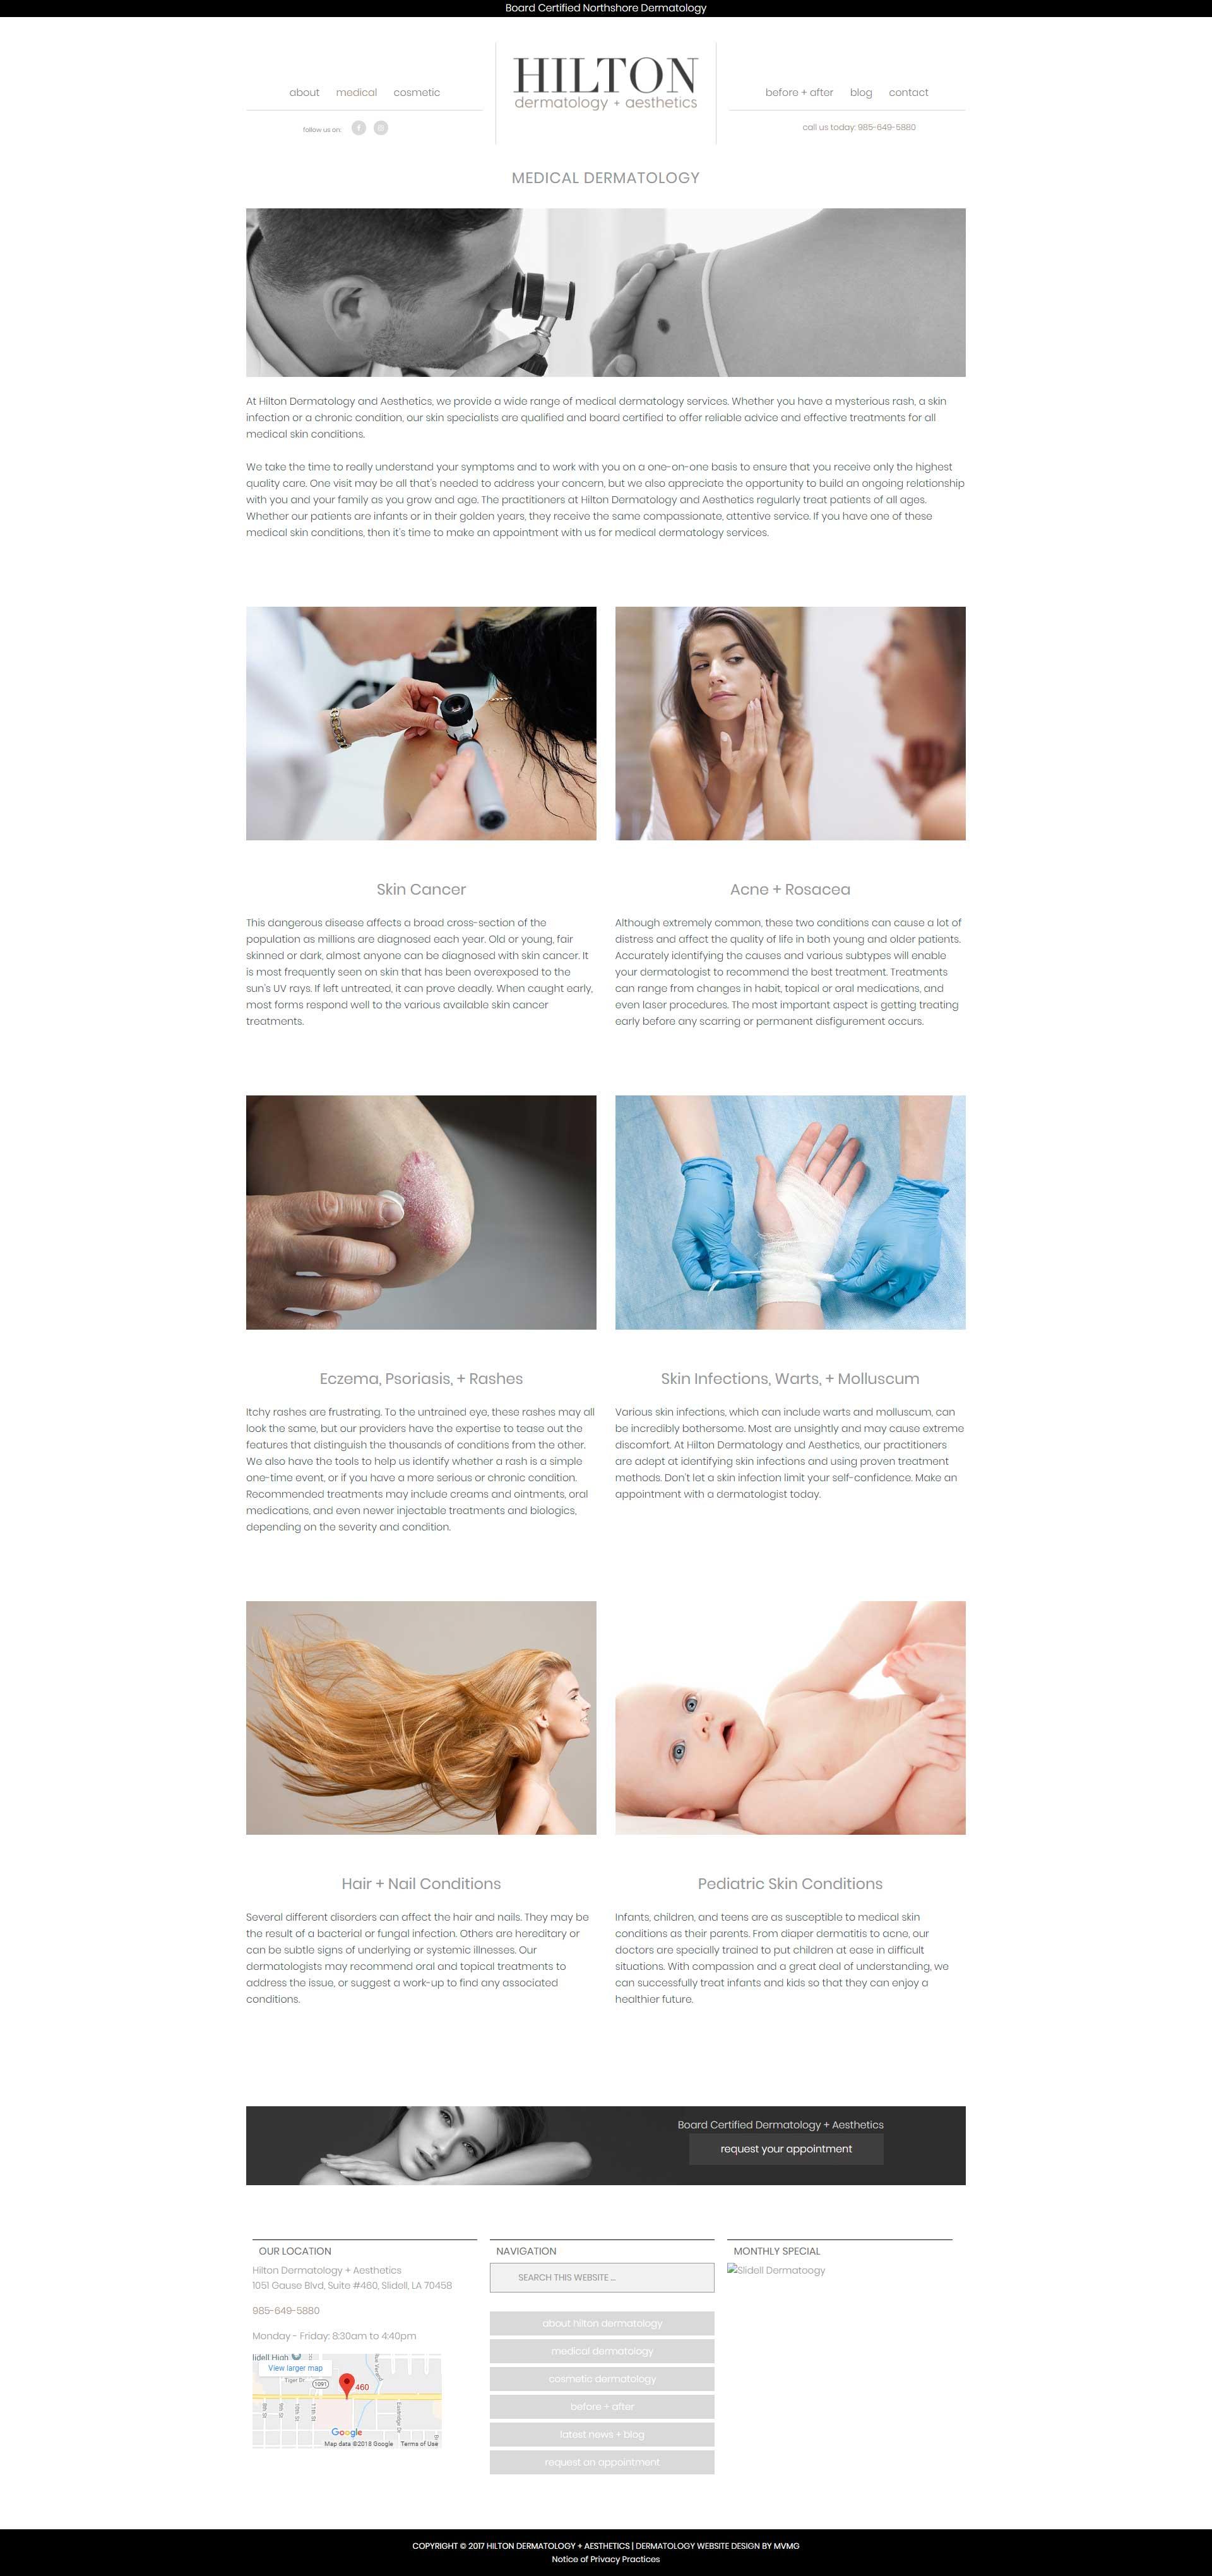 hiltondermatology-medical-dermatology-2018-07-09-15_30_29